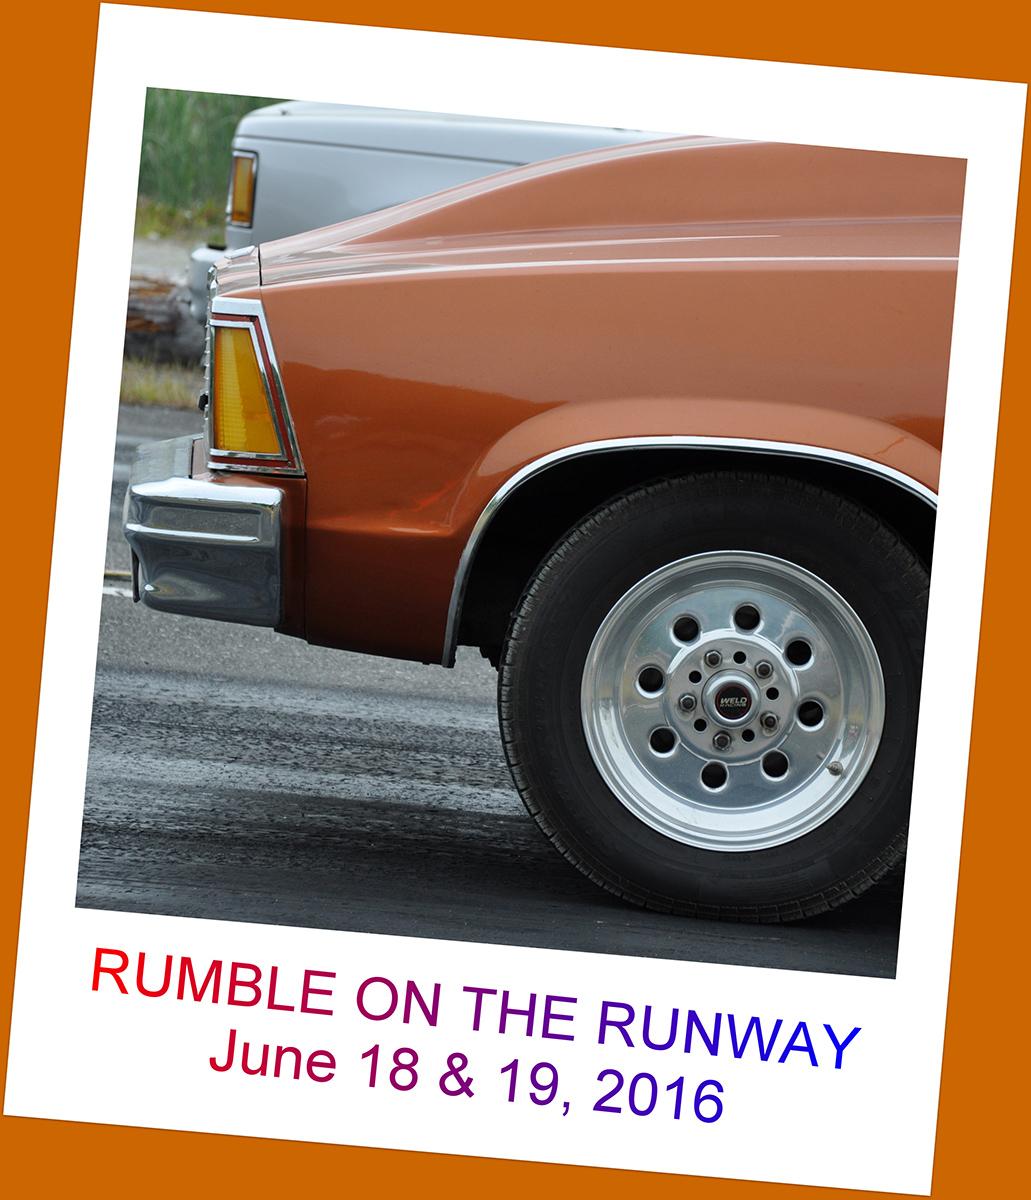 Rumble on the Runway June 18 & 19, 2016 1115